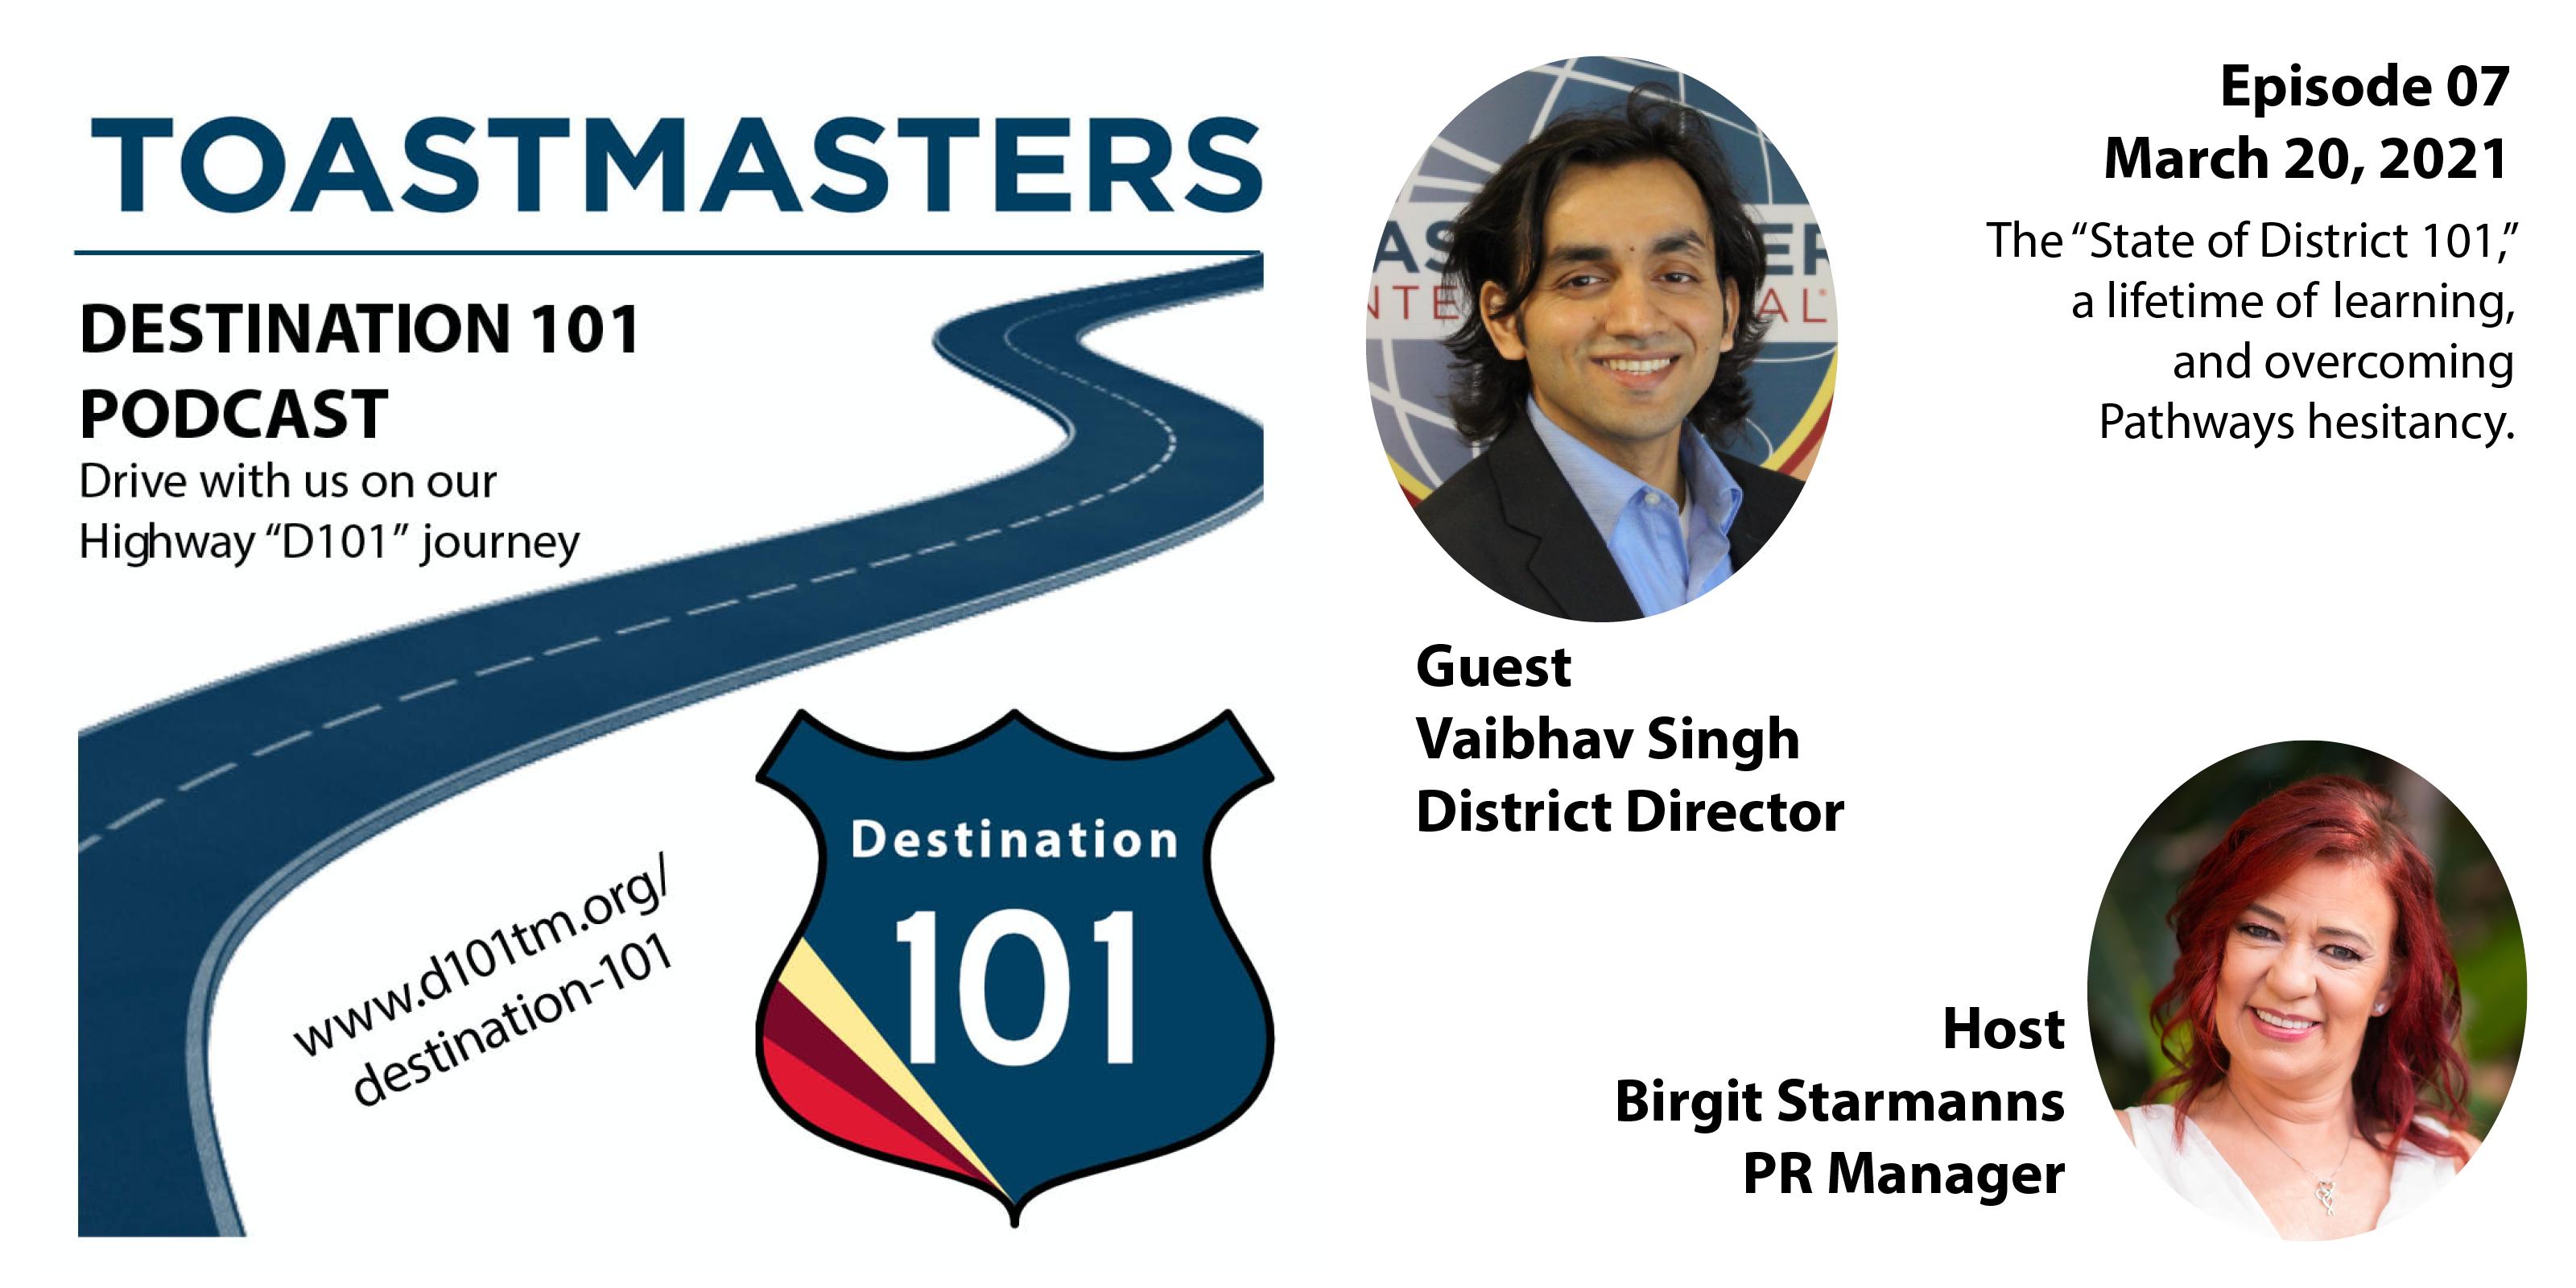 2020-21 District 101 Leadership Team